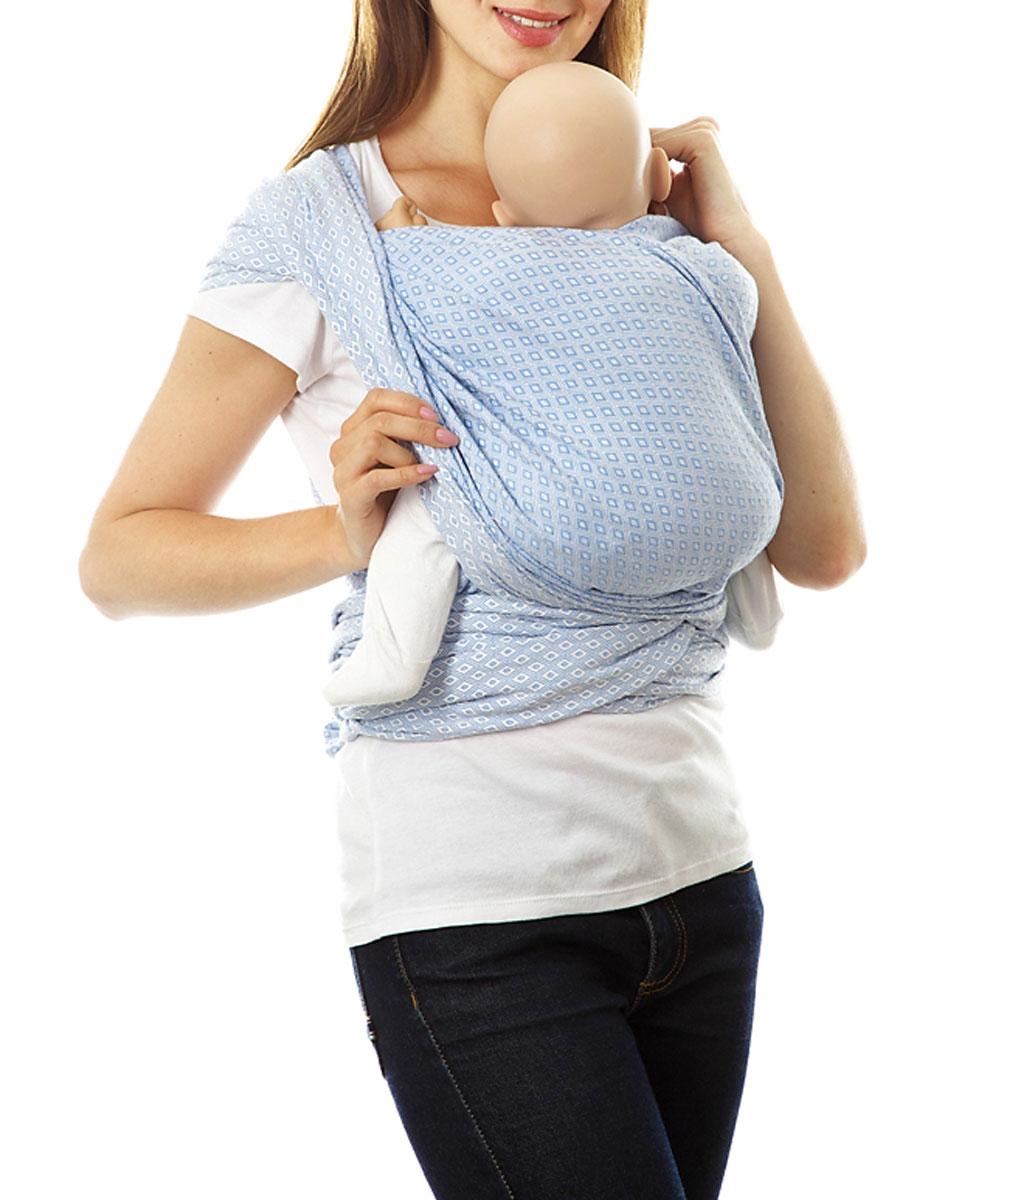 Слинг-шарф Mum's Era  Диамант , цвет: скай. Размер M -  Рюкзаки, слинги, кенгуру